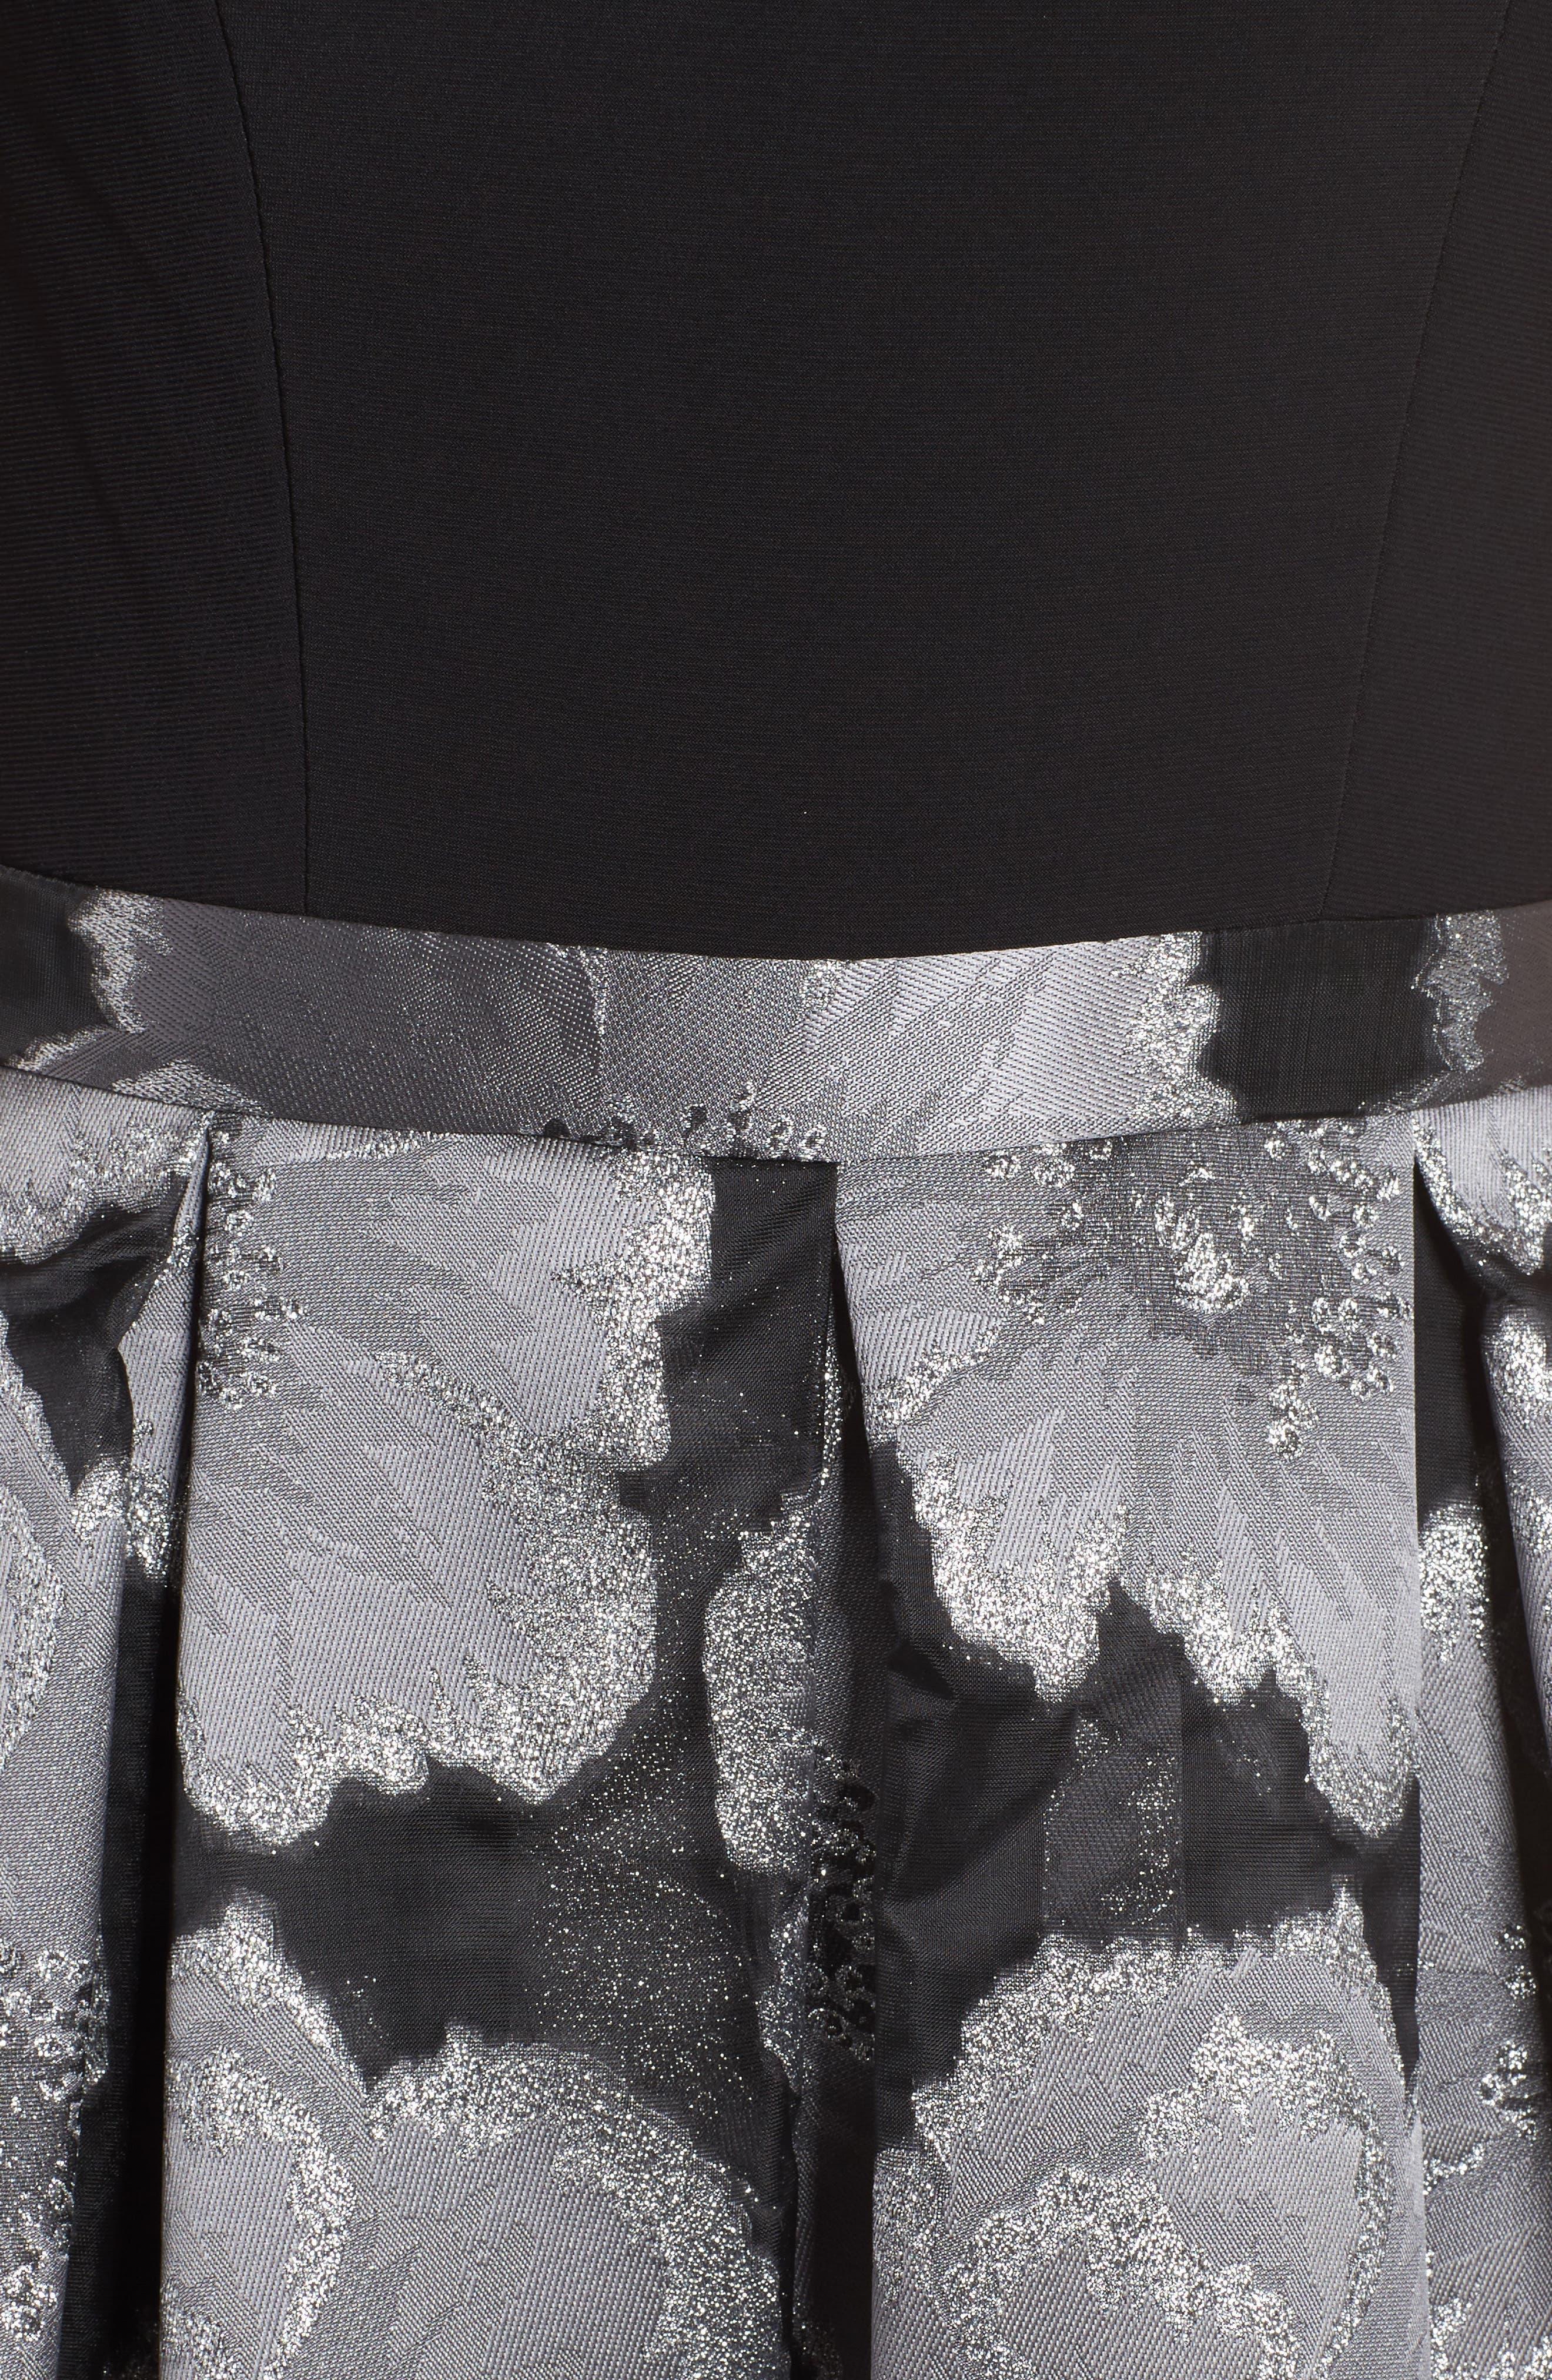 Mixed Media Off the Shoulder Dress,                             Alternate thumbnail 5, color,                             Black/ Silver